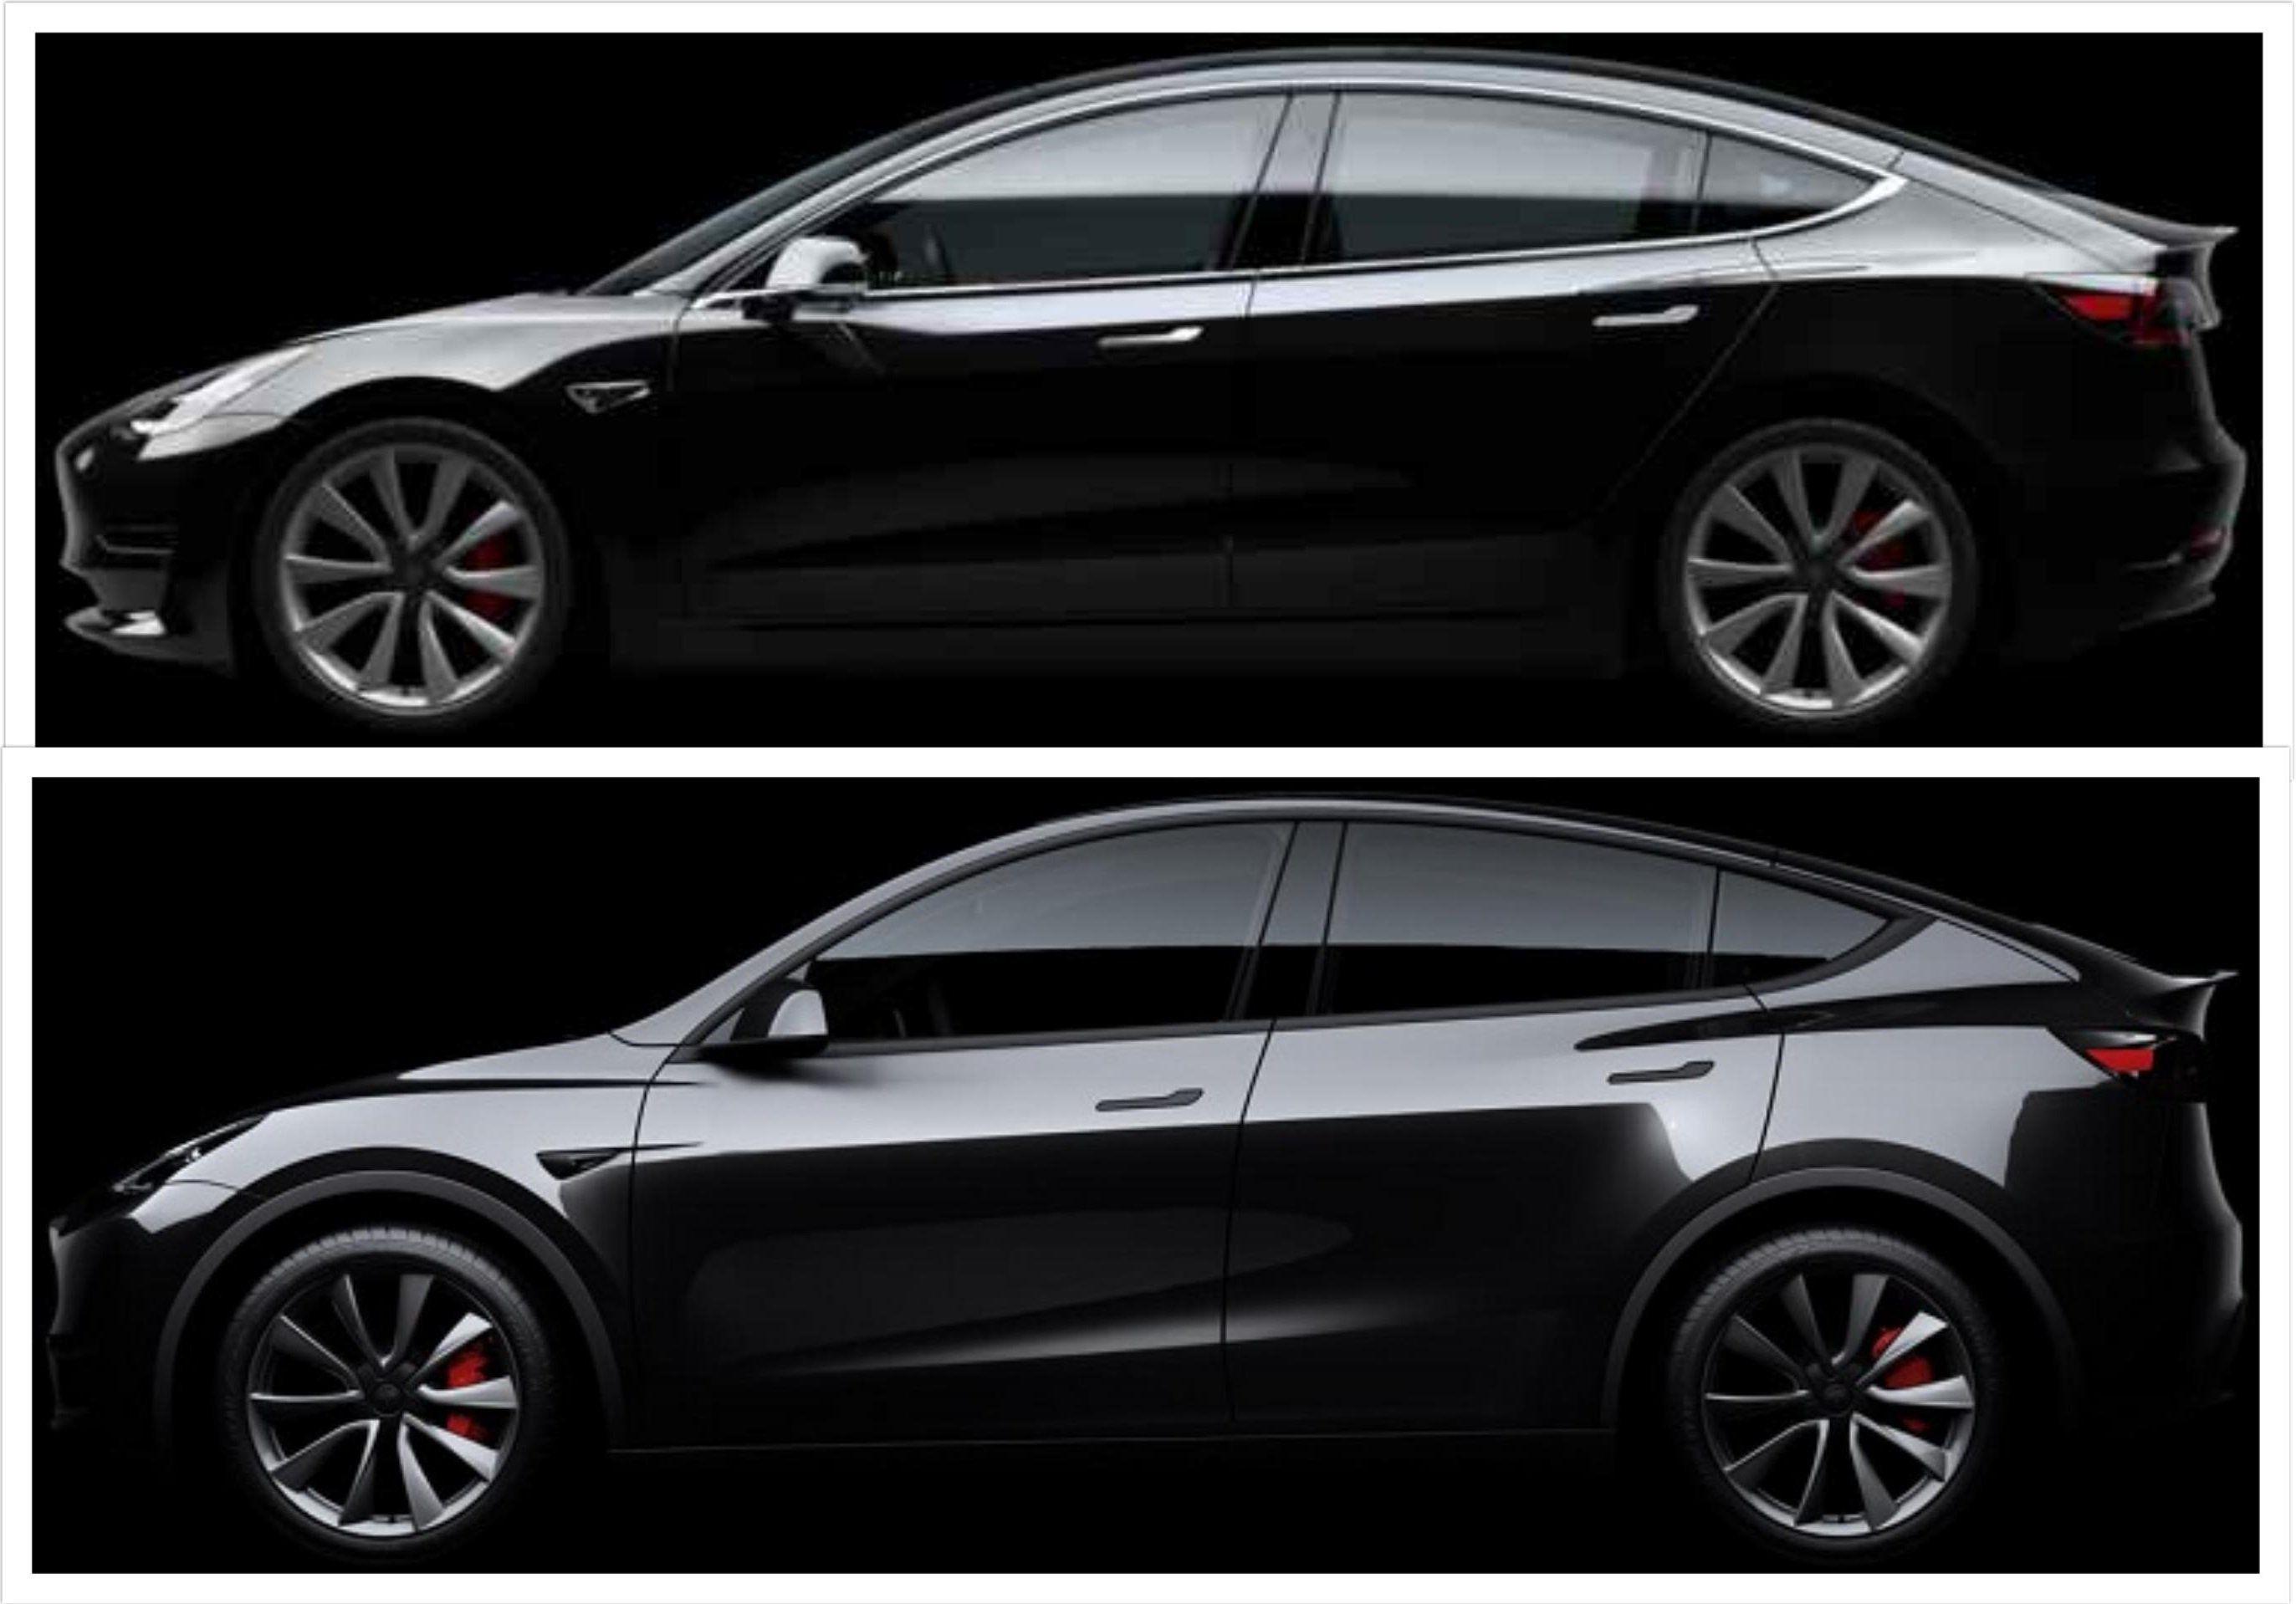 Tesla Model Y And Model 3 Visual Comparison Side By Side Morphing More Tesla Model Tesla Tesla Car